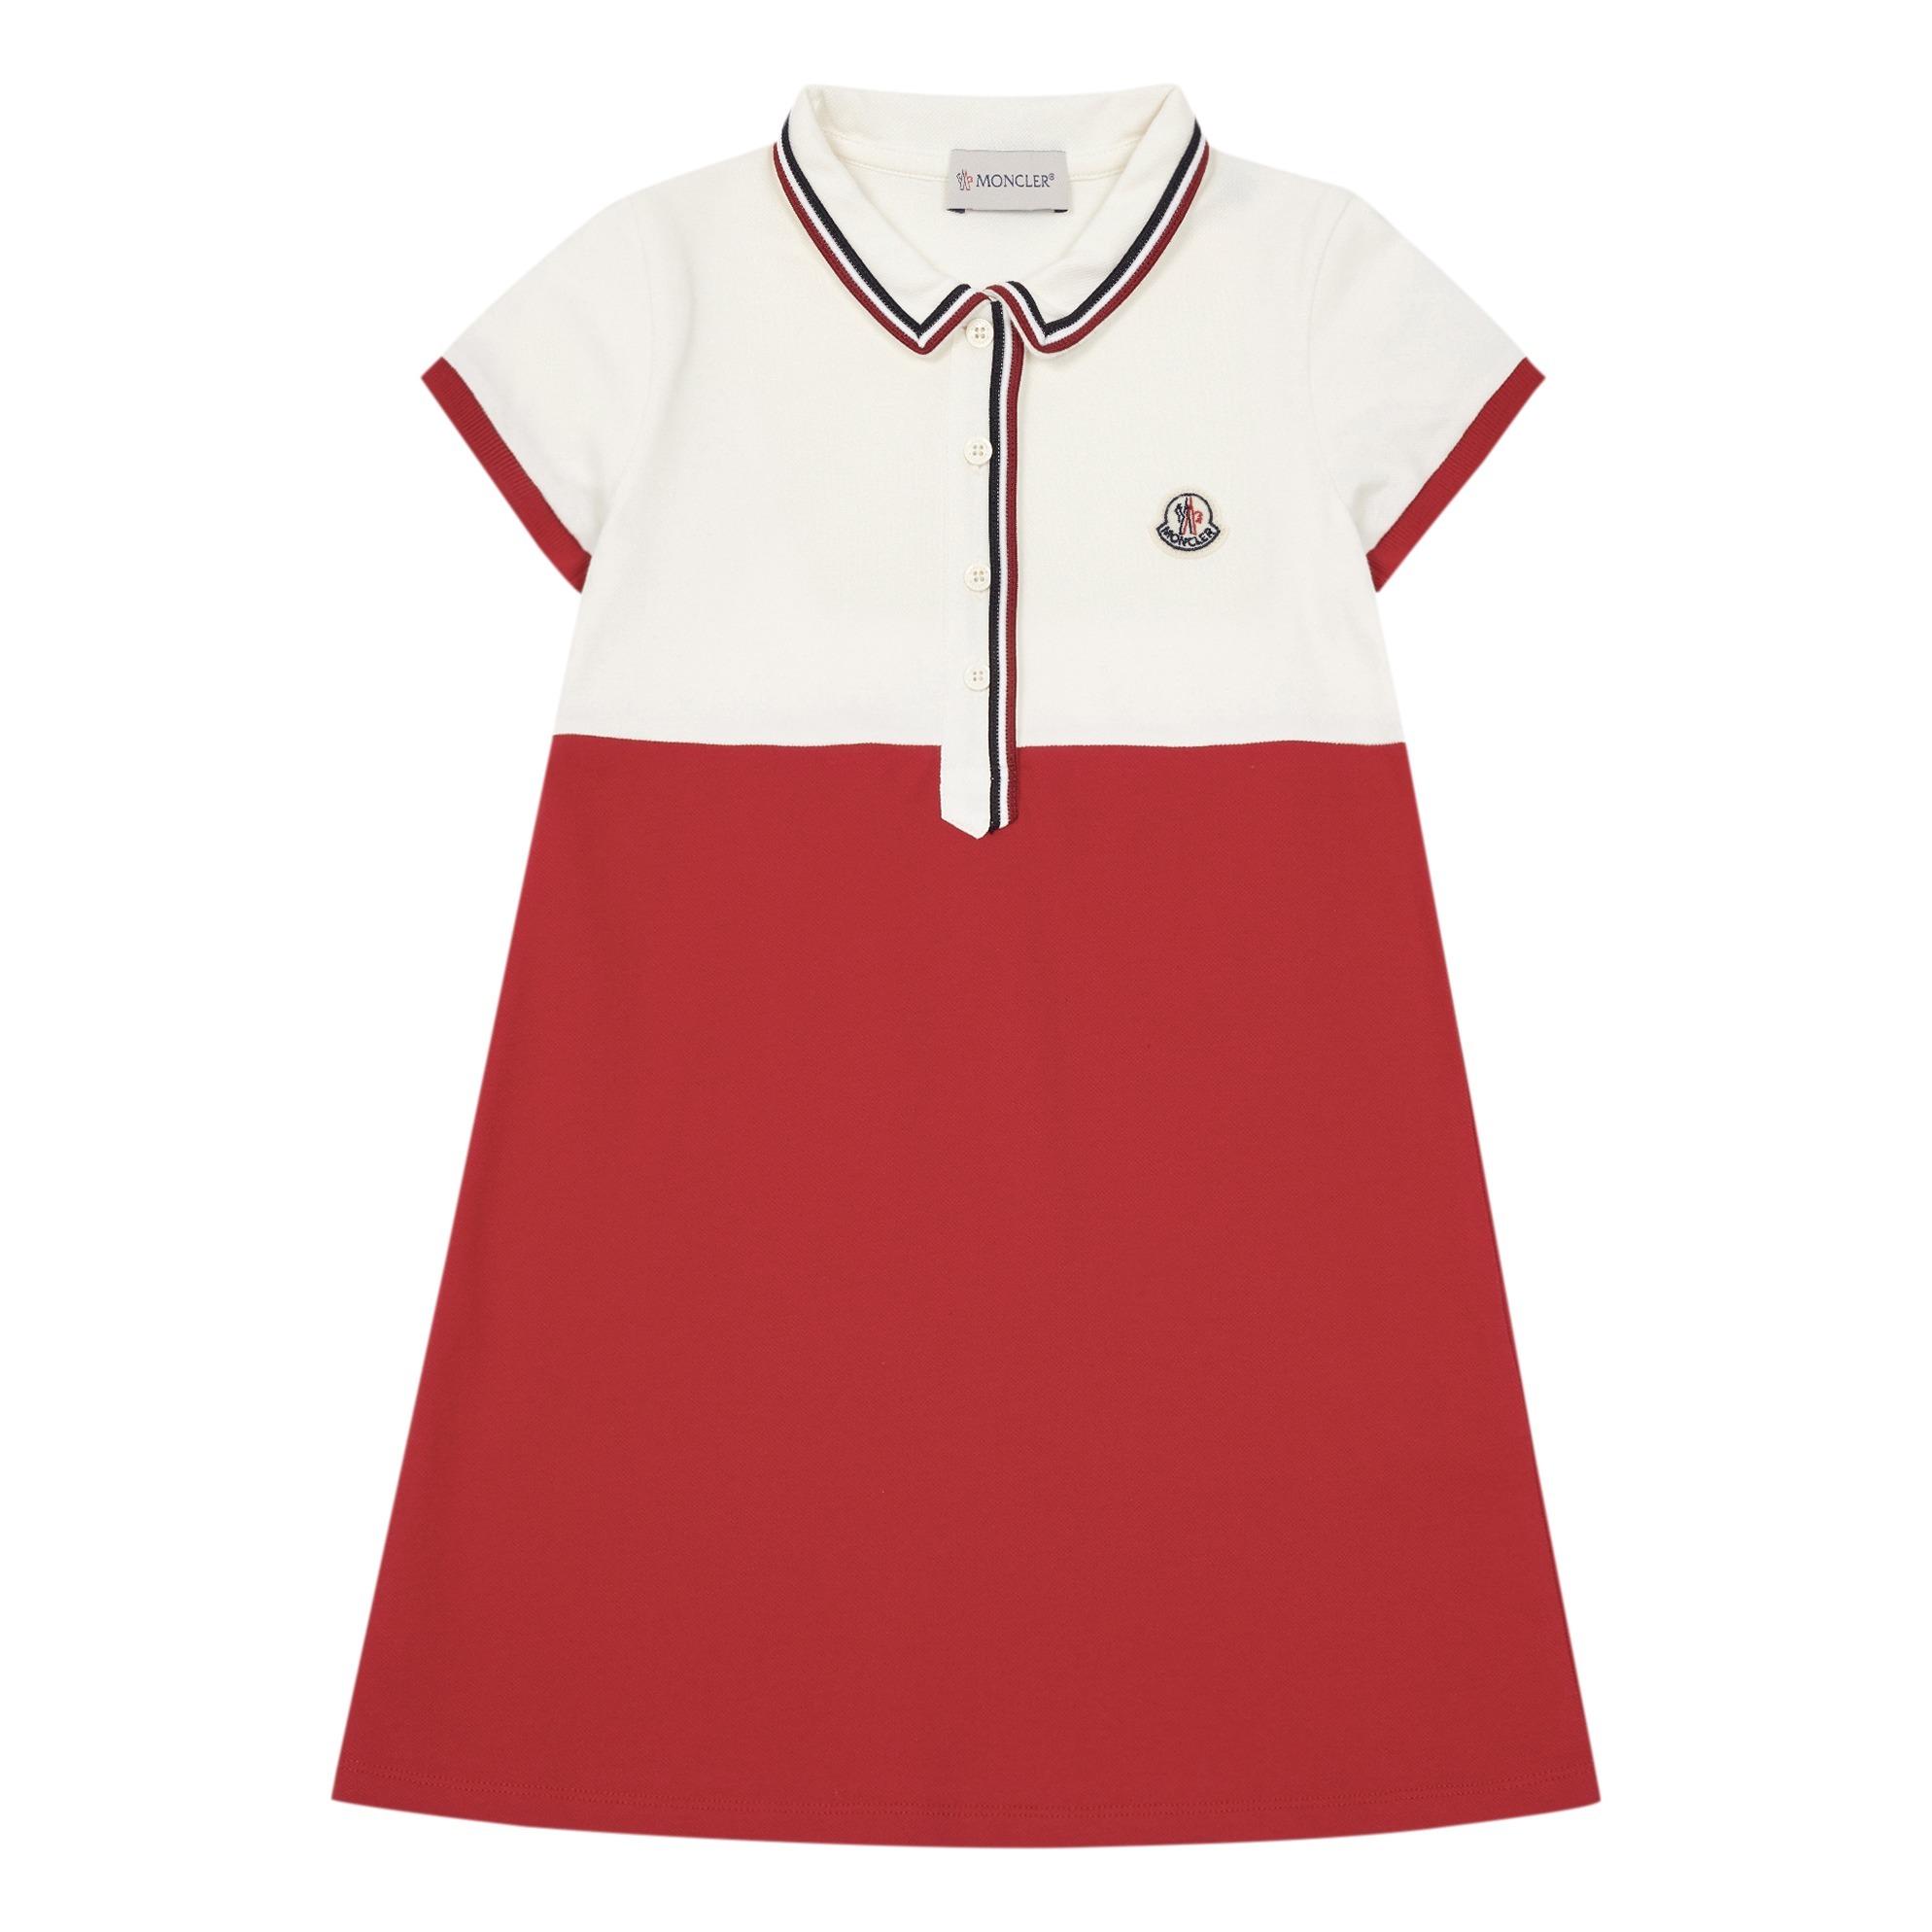 d245f11d2 Abito polo dress White Moncler Fashion Teen , Children